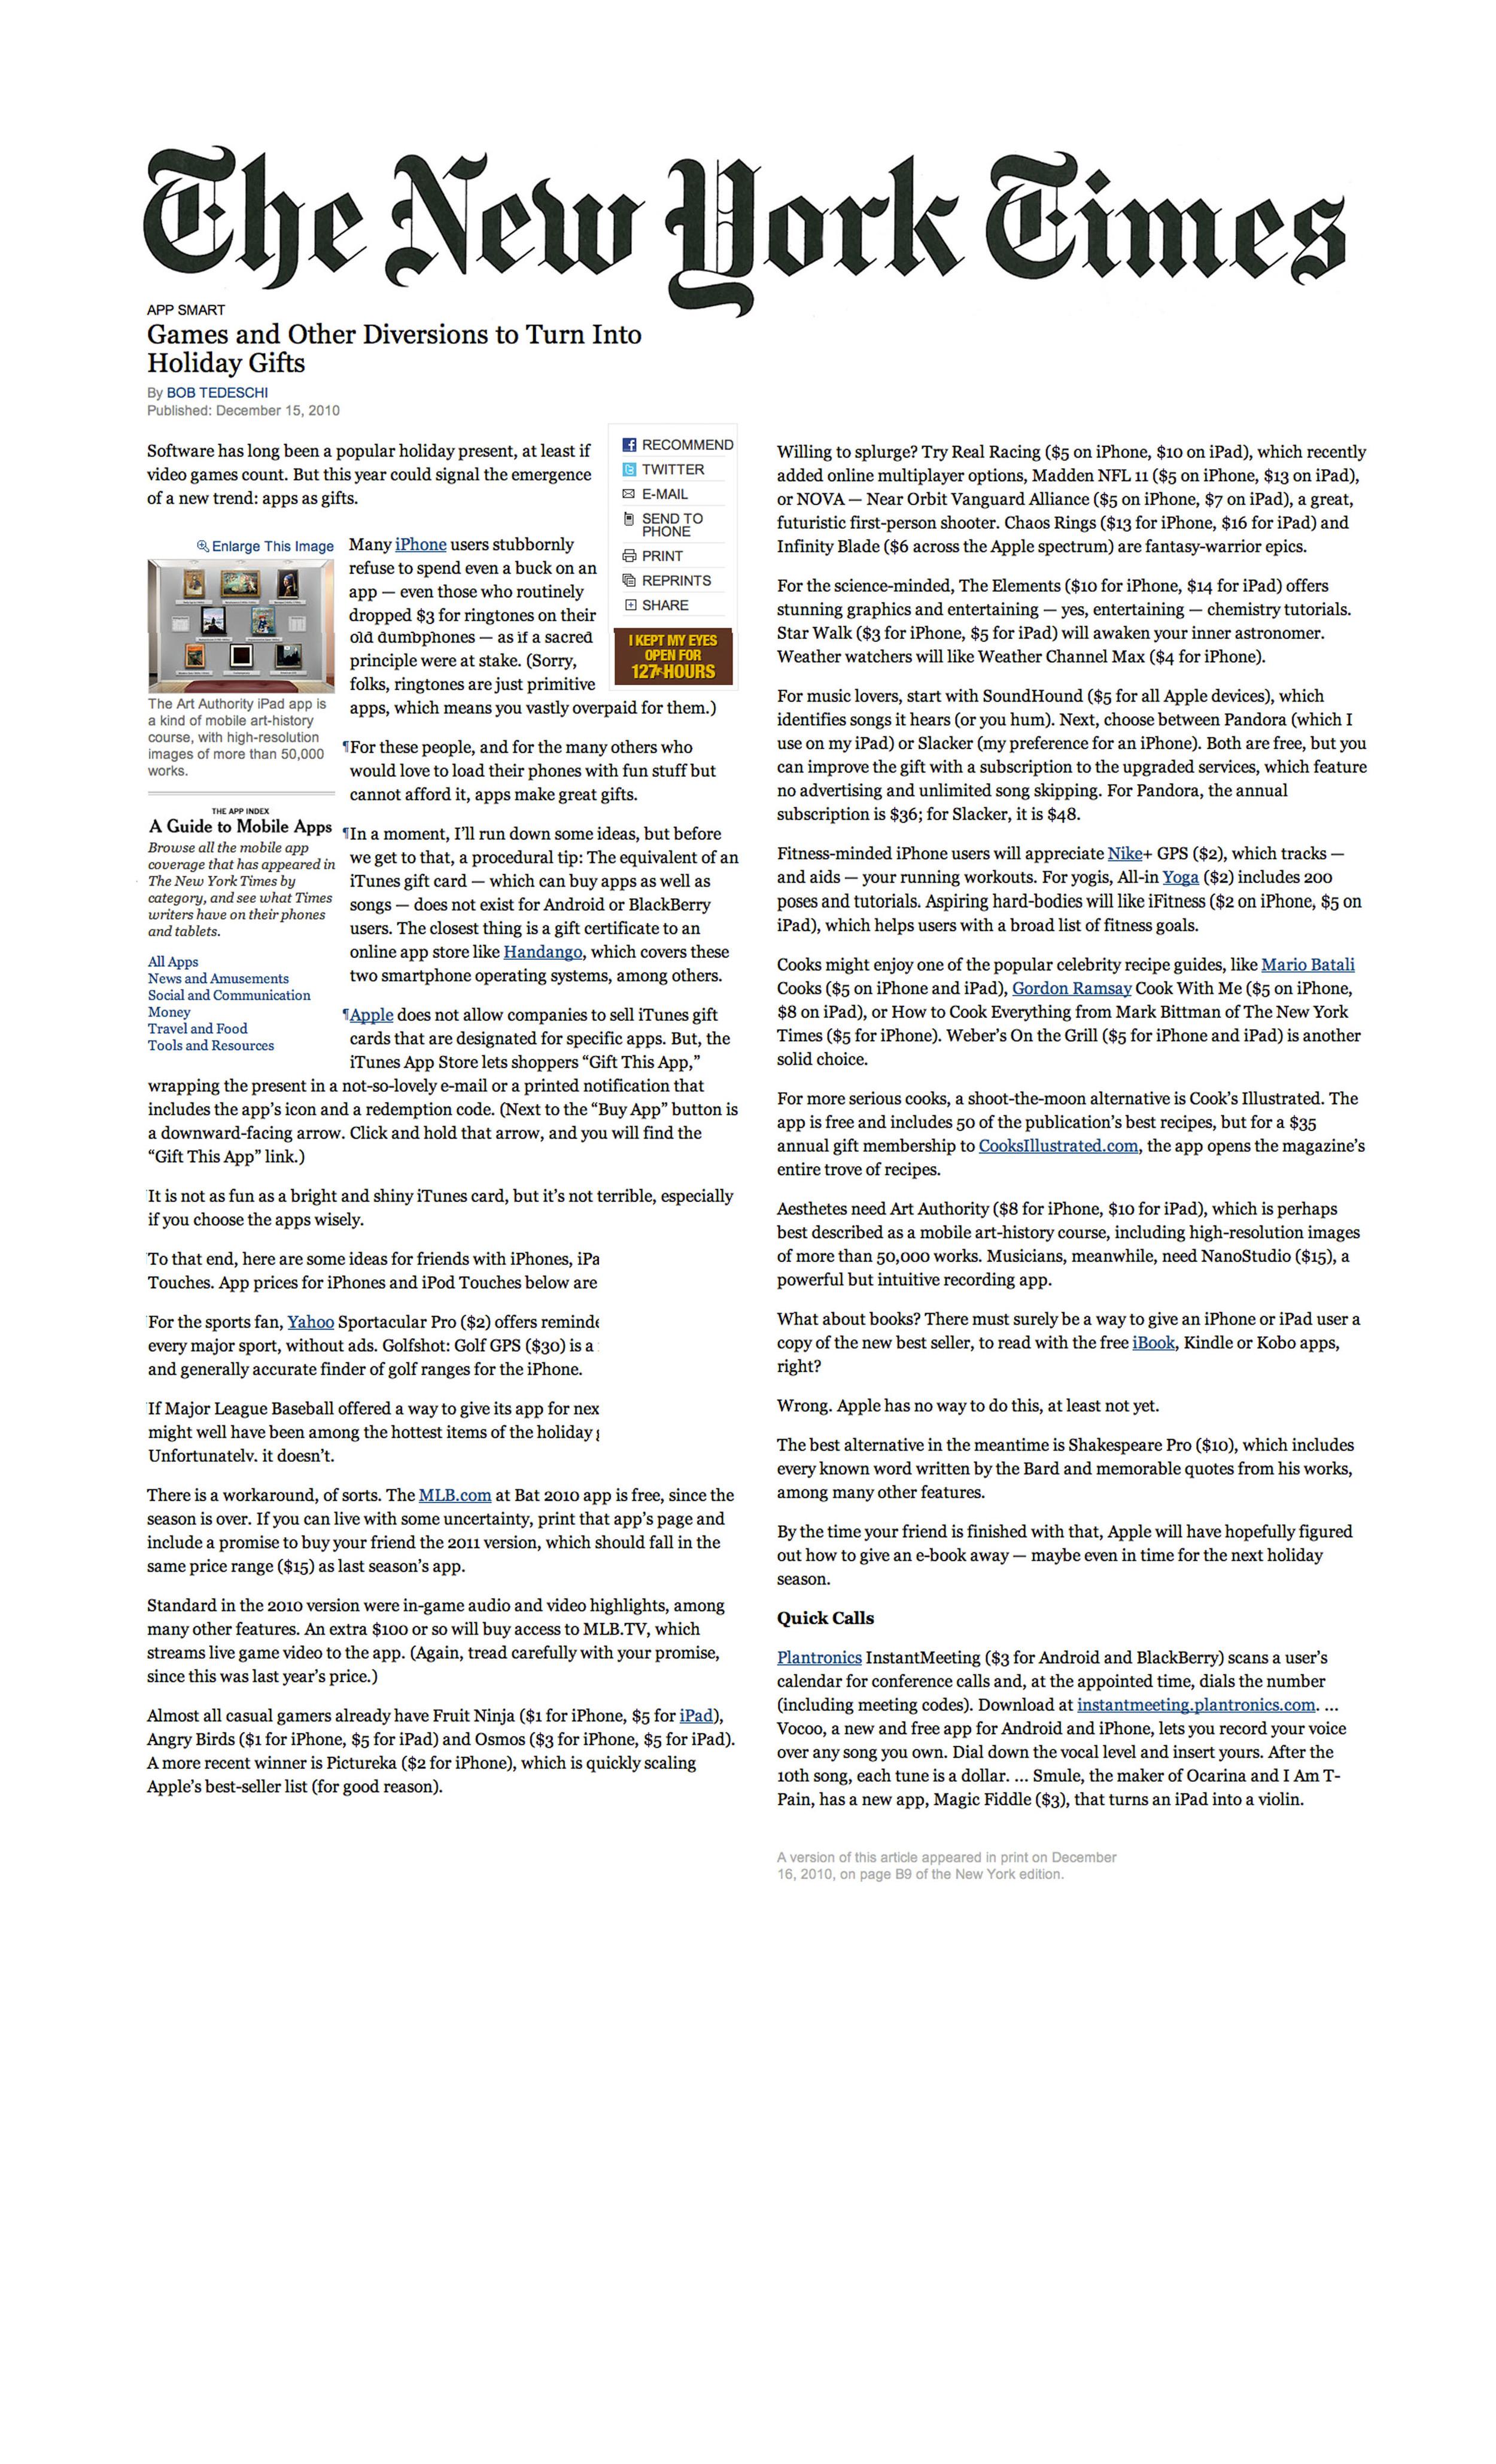 Osmos presskit_0007_New York Times.jpg